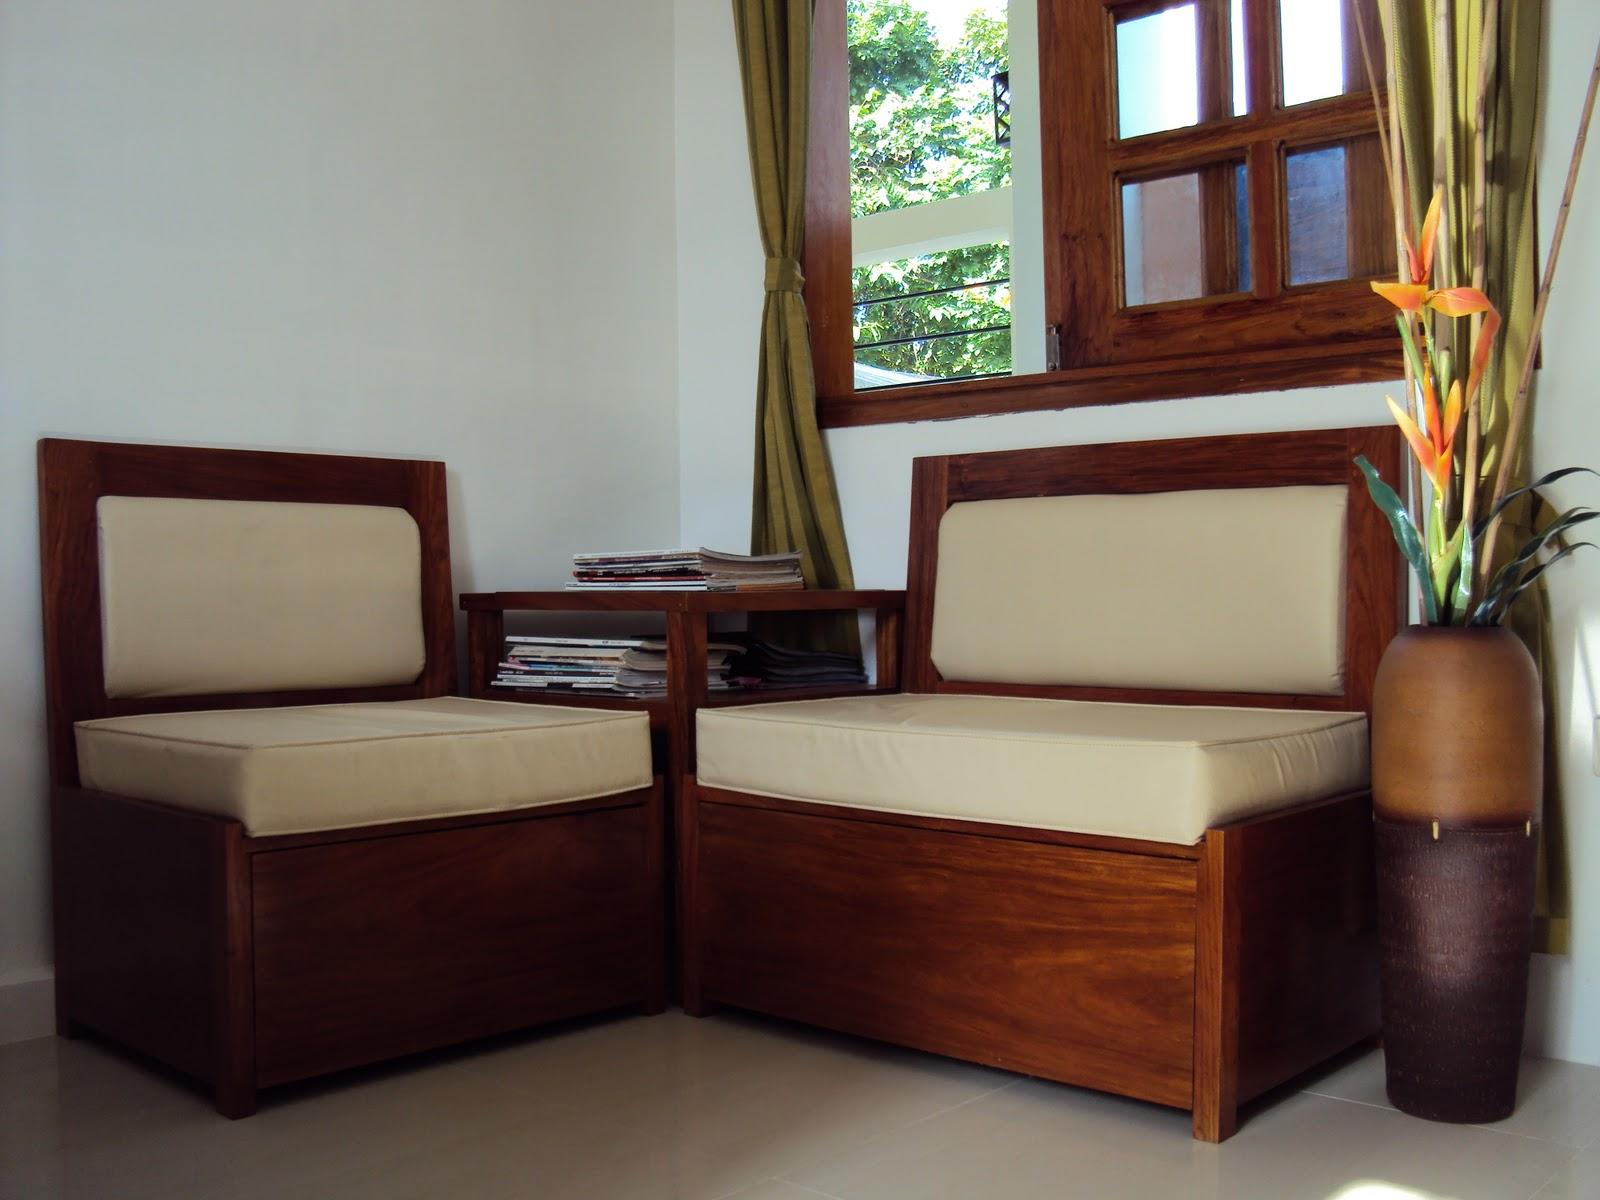 teak wood sofa set philippines full sleeper under 500 narra design energywarden